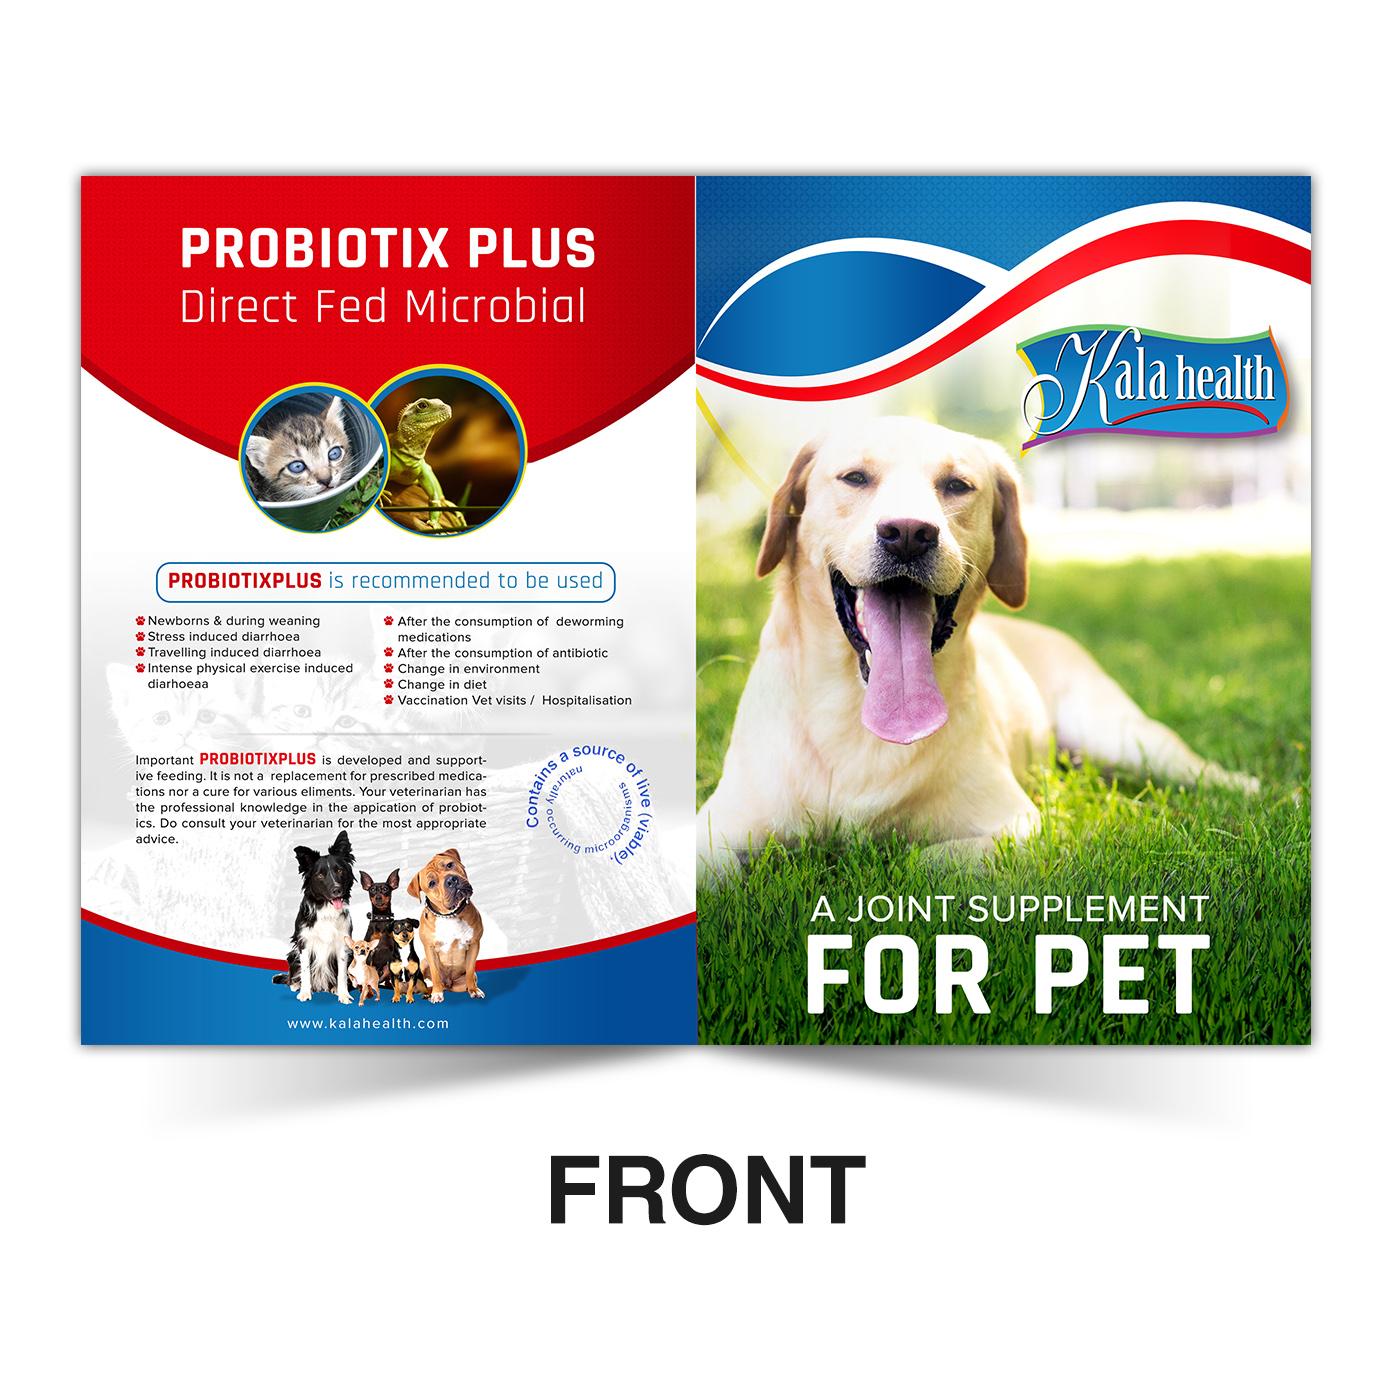 Elegant, Professional, Health Product Brochure Design for